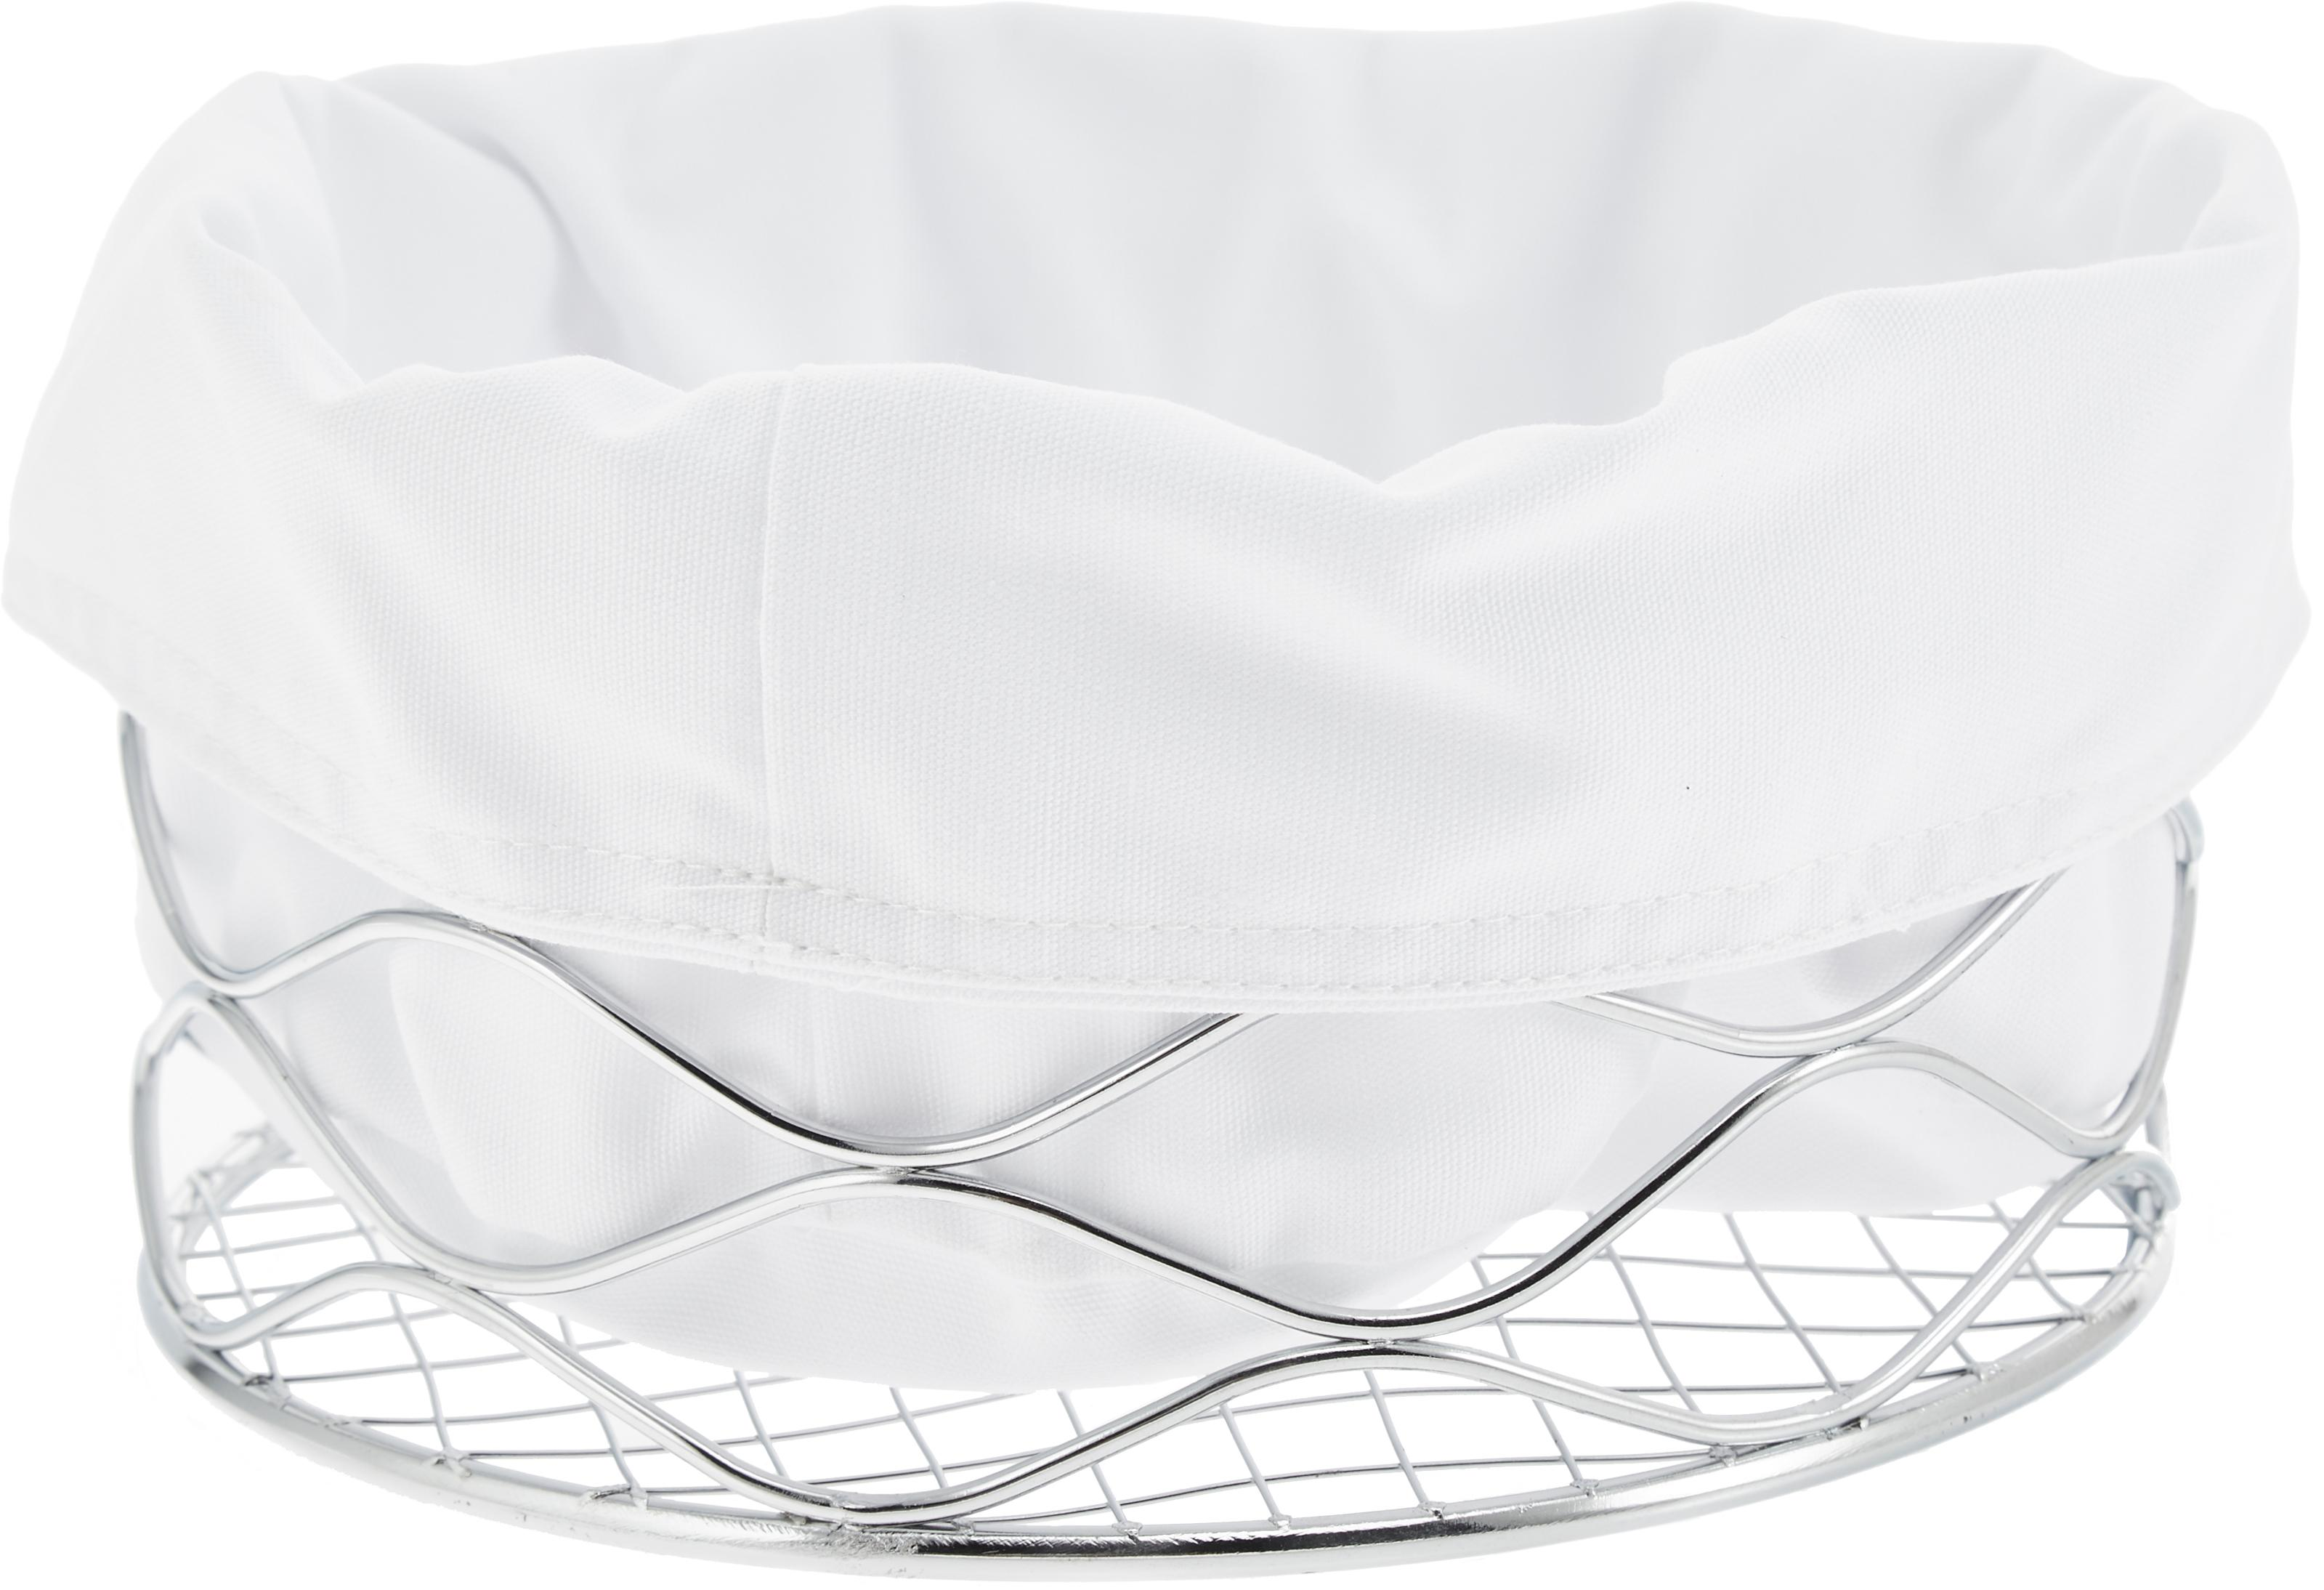 Panera Alana, Funda: 100% algodón, Cromo, blanco, Ø 21 x 11 cm